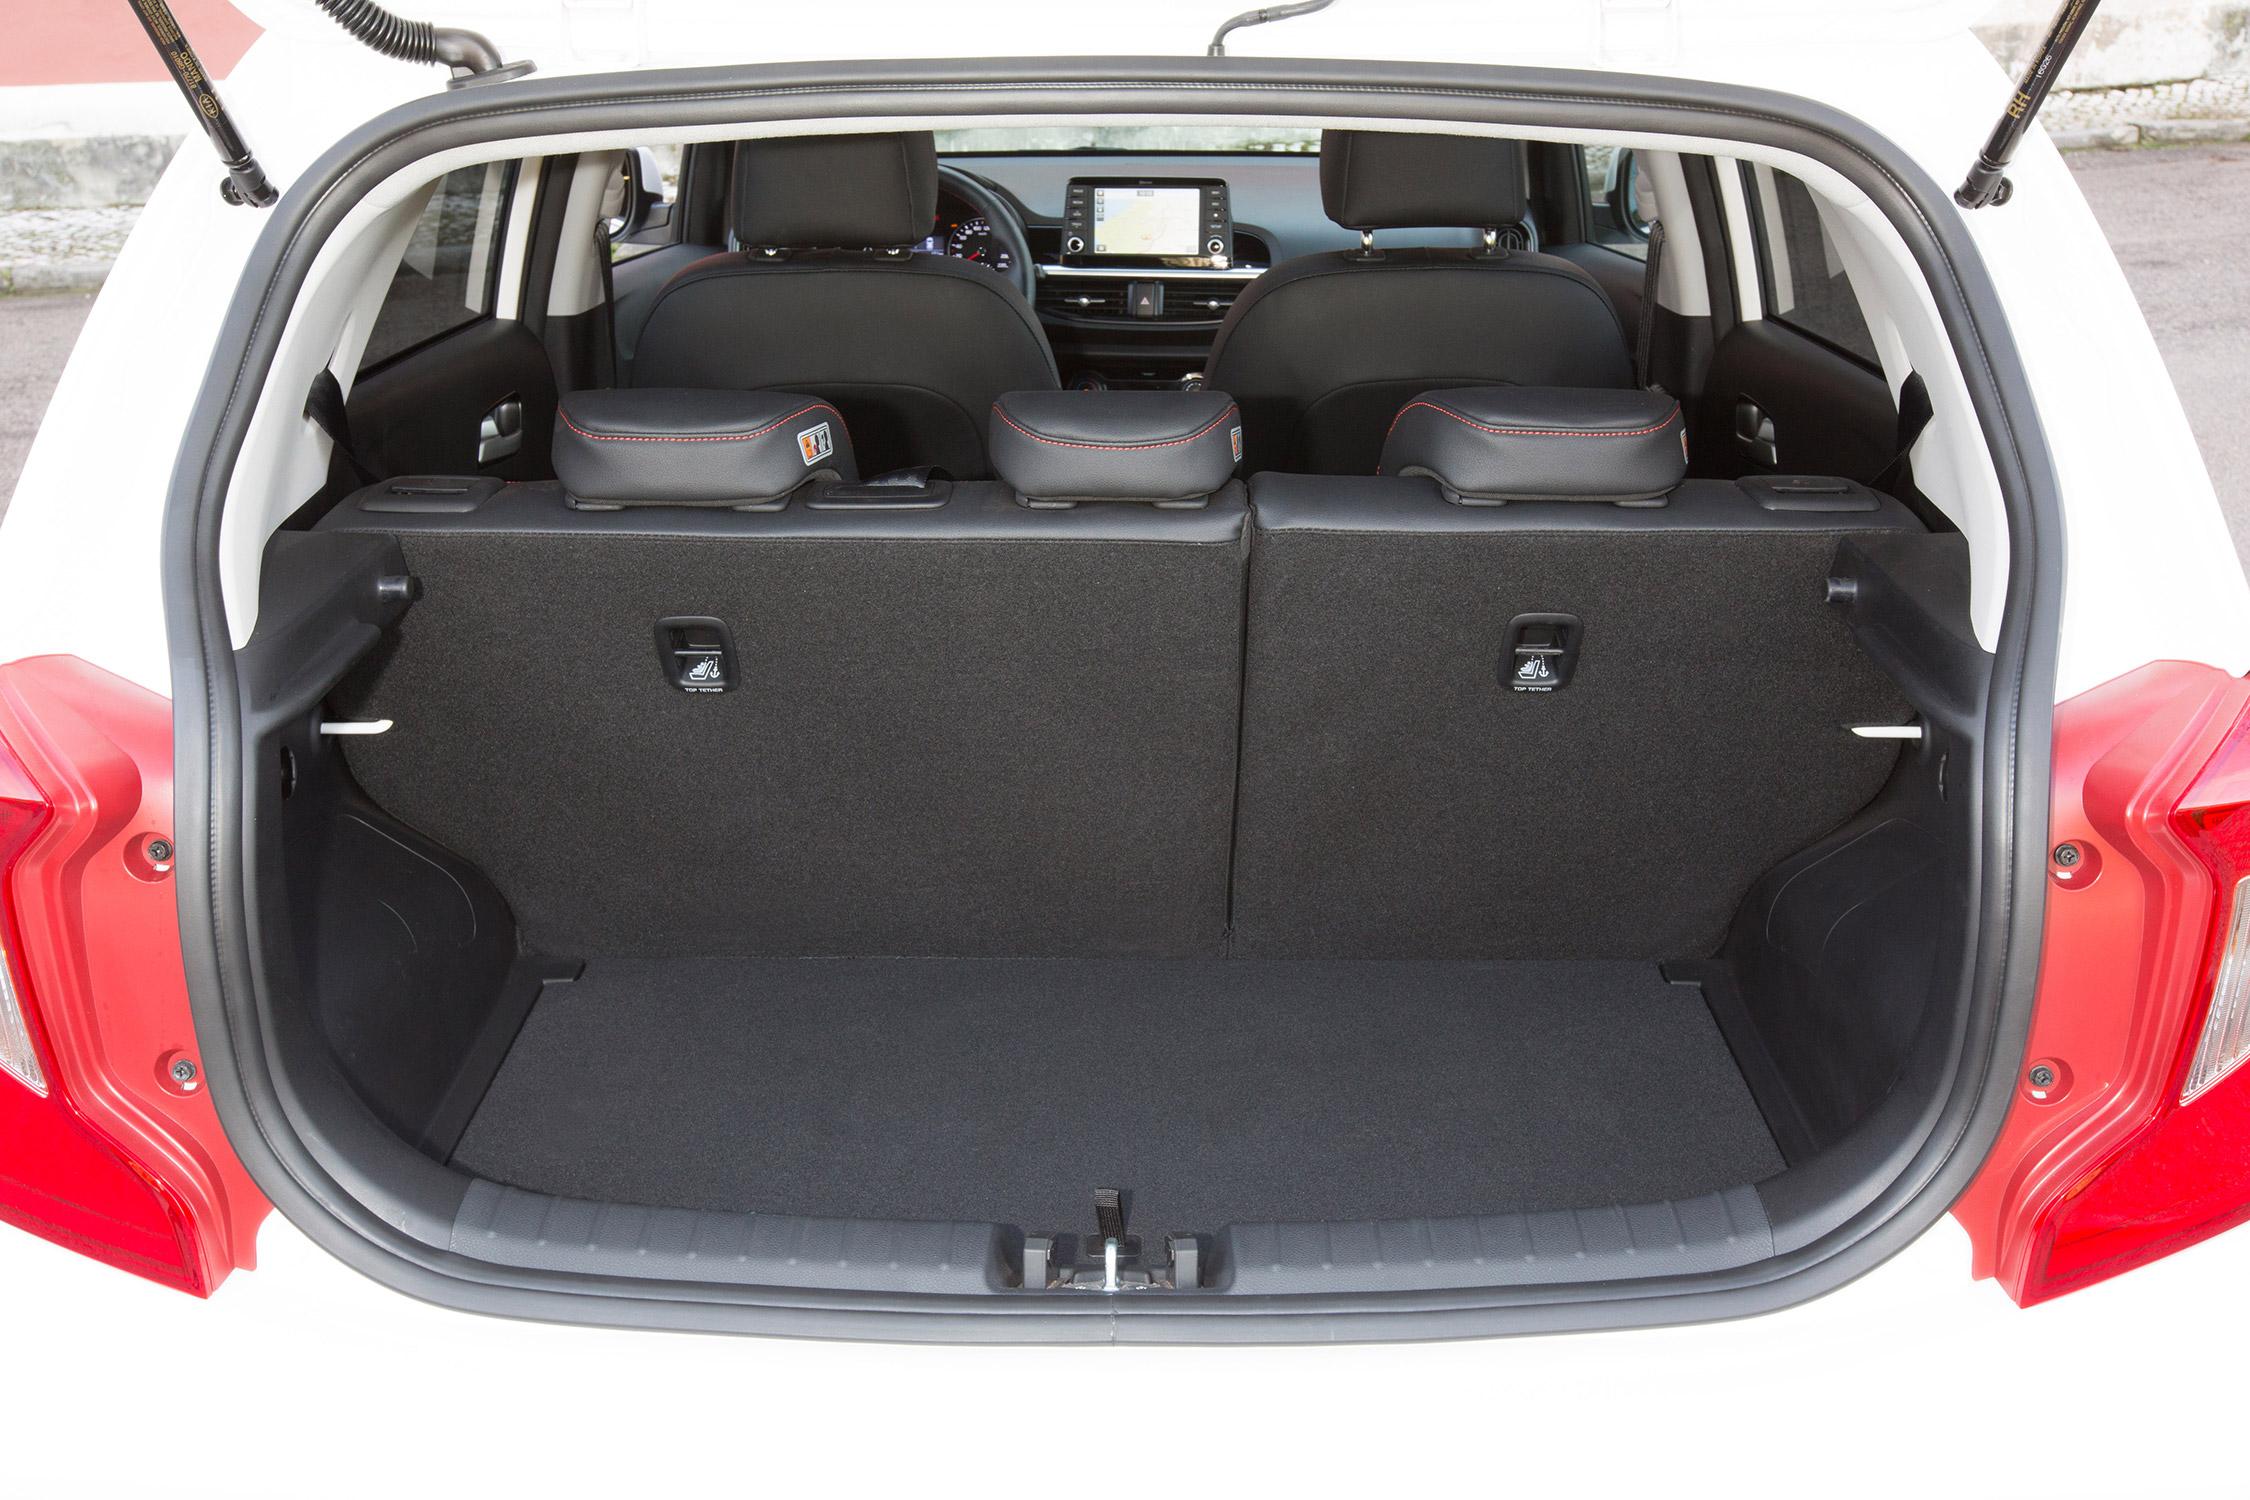 Kia Picanto Iii Ch on Mitsubishi Eclipse Gt